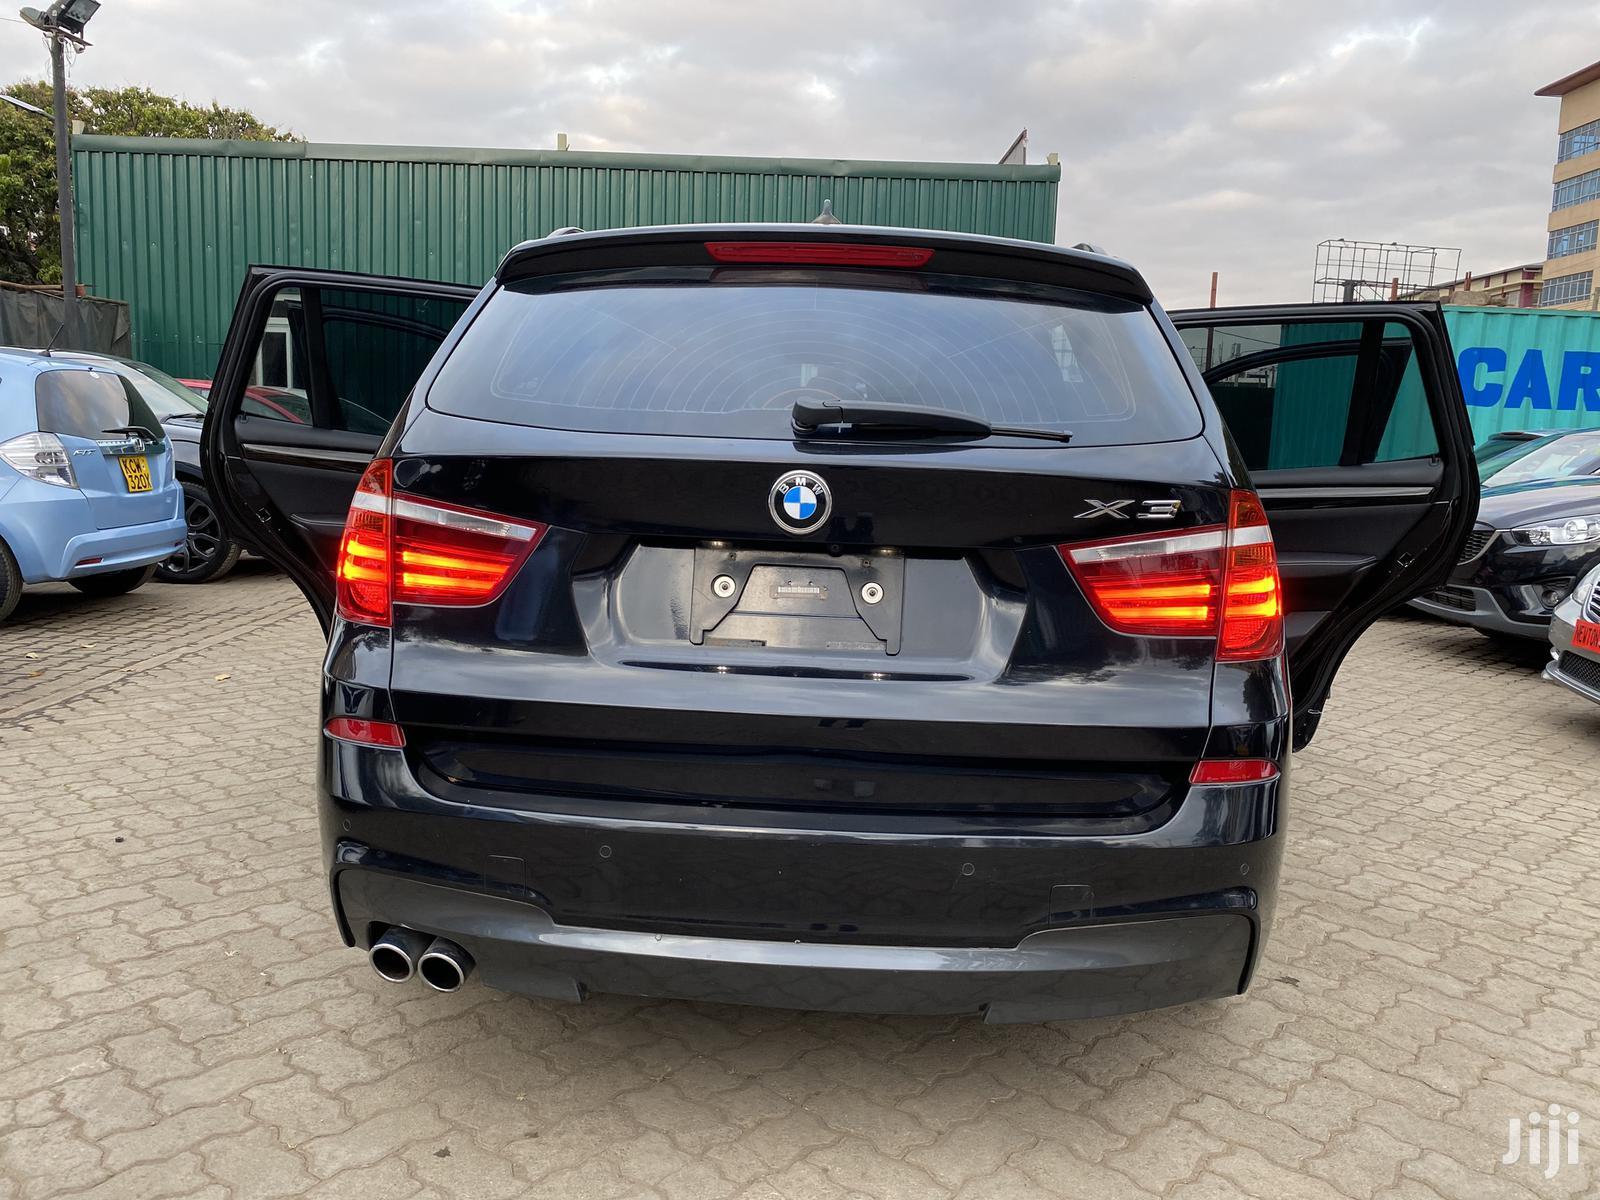 BMW X3 2011 Black | Cars for sale in Kilimani, Nairobi, Kenya